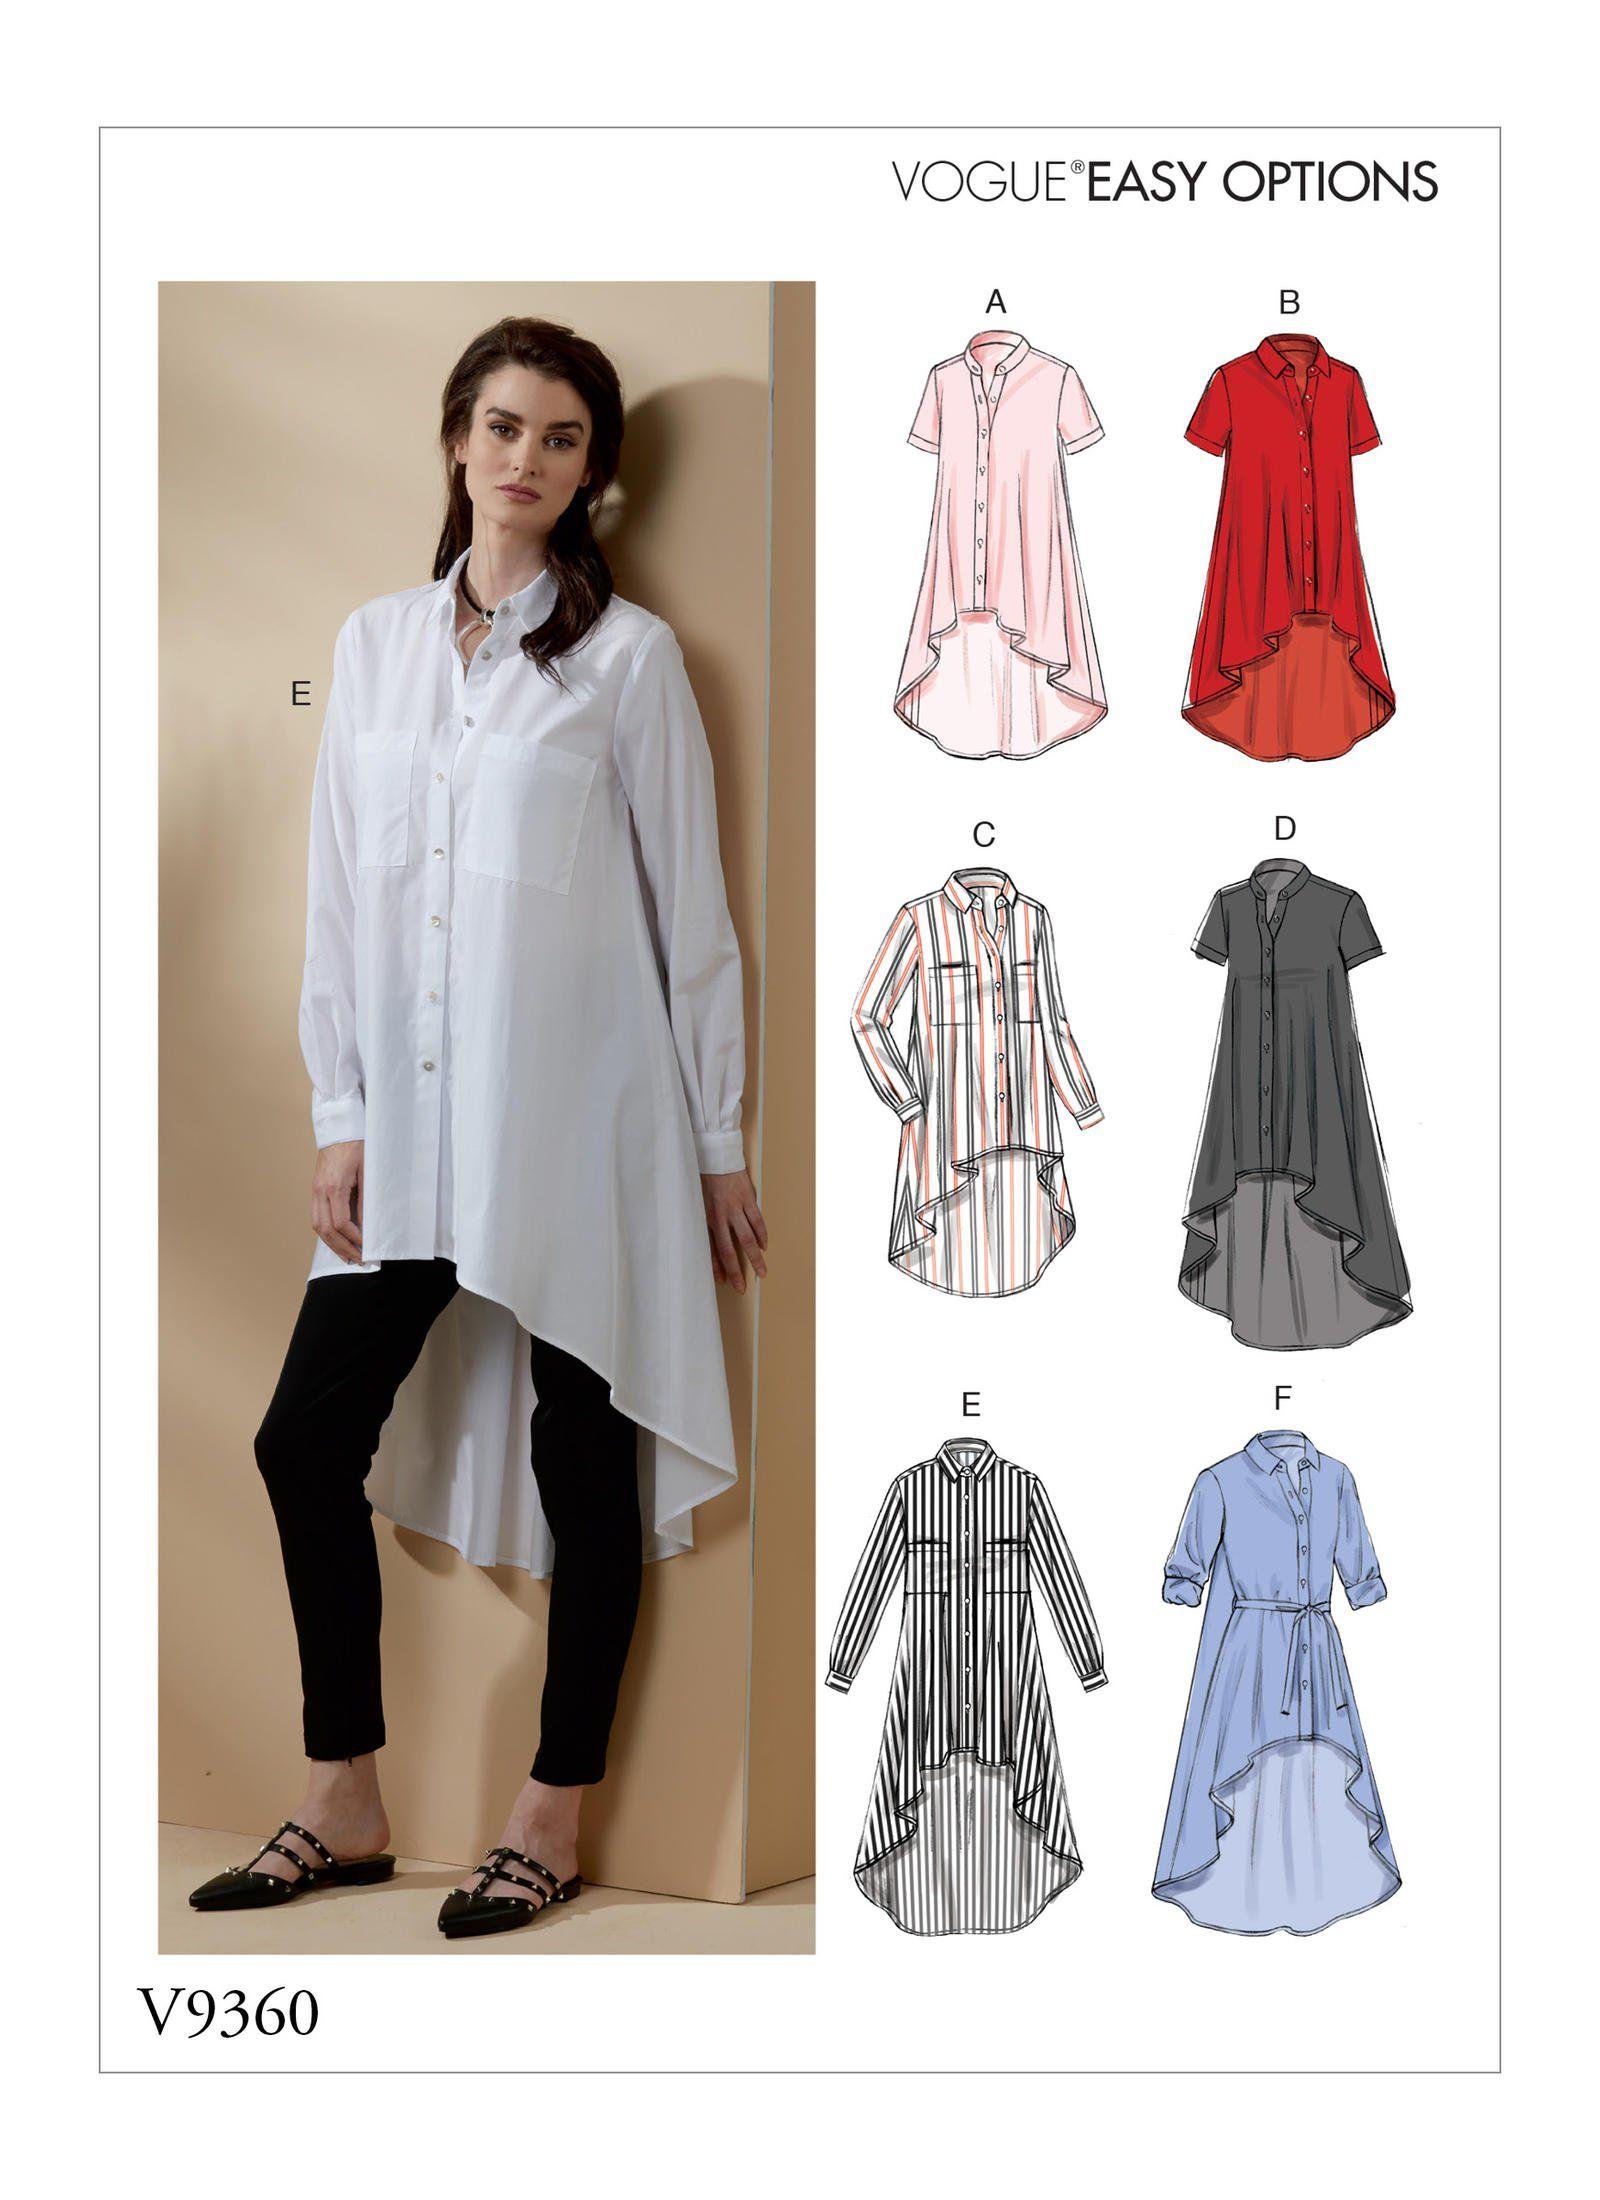 Vogue Patterns 9360 Misses Shirt And Belt Women Top Sewing